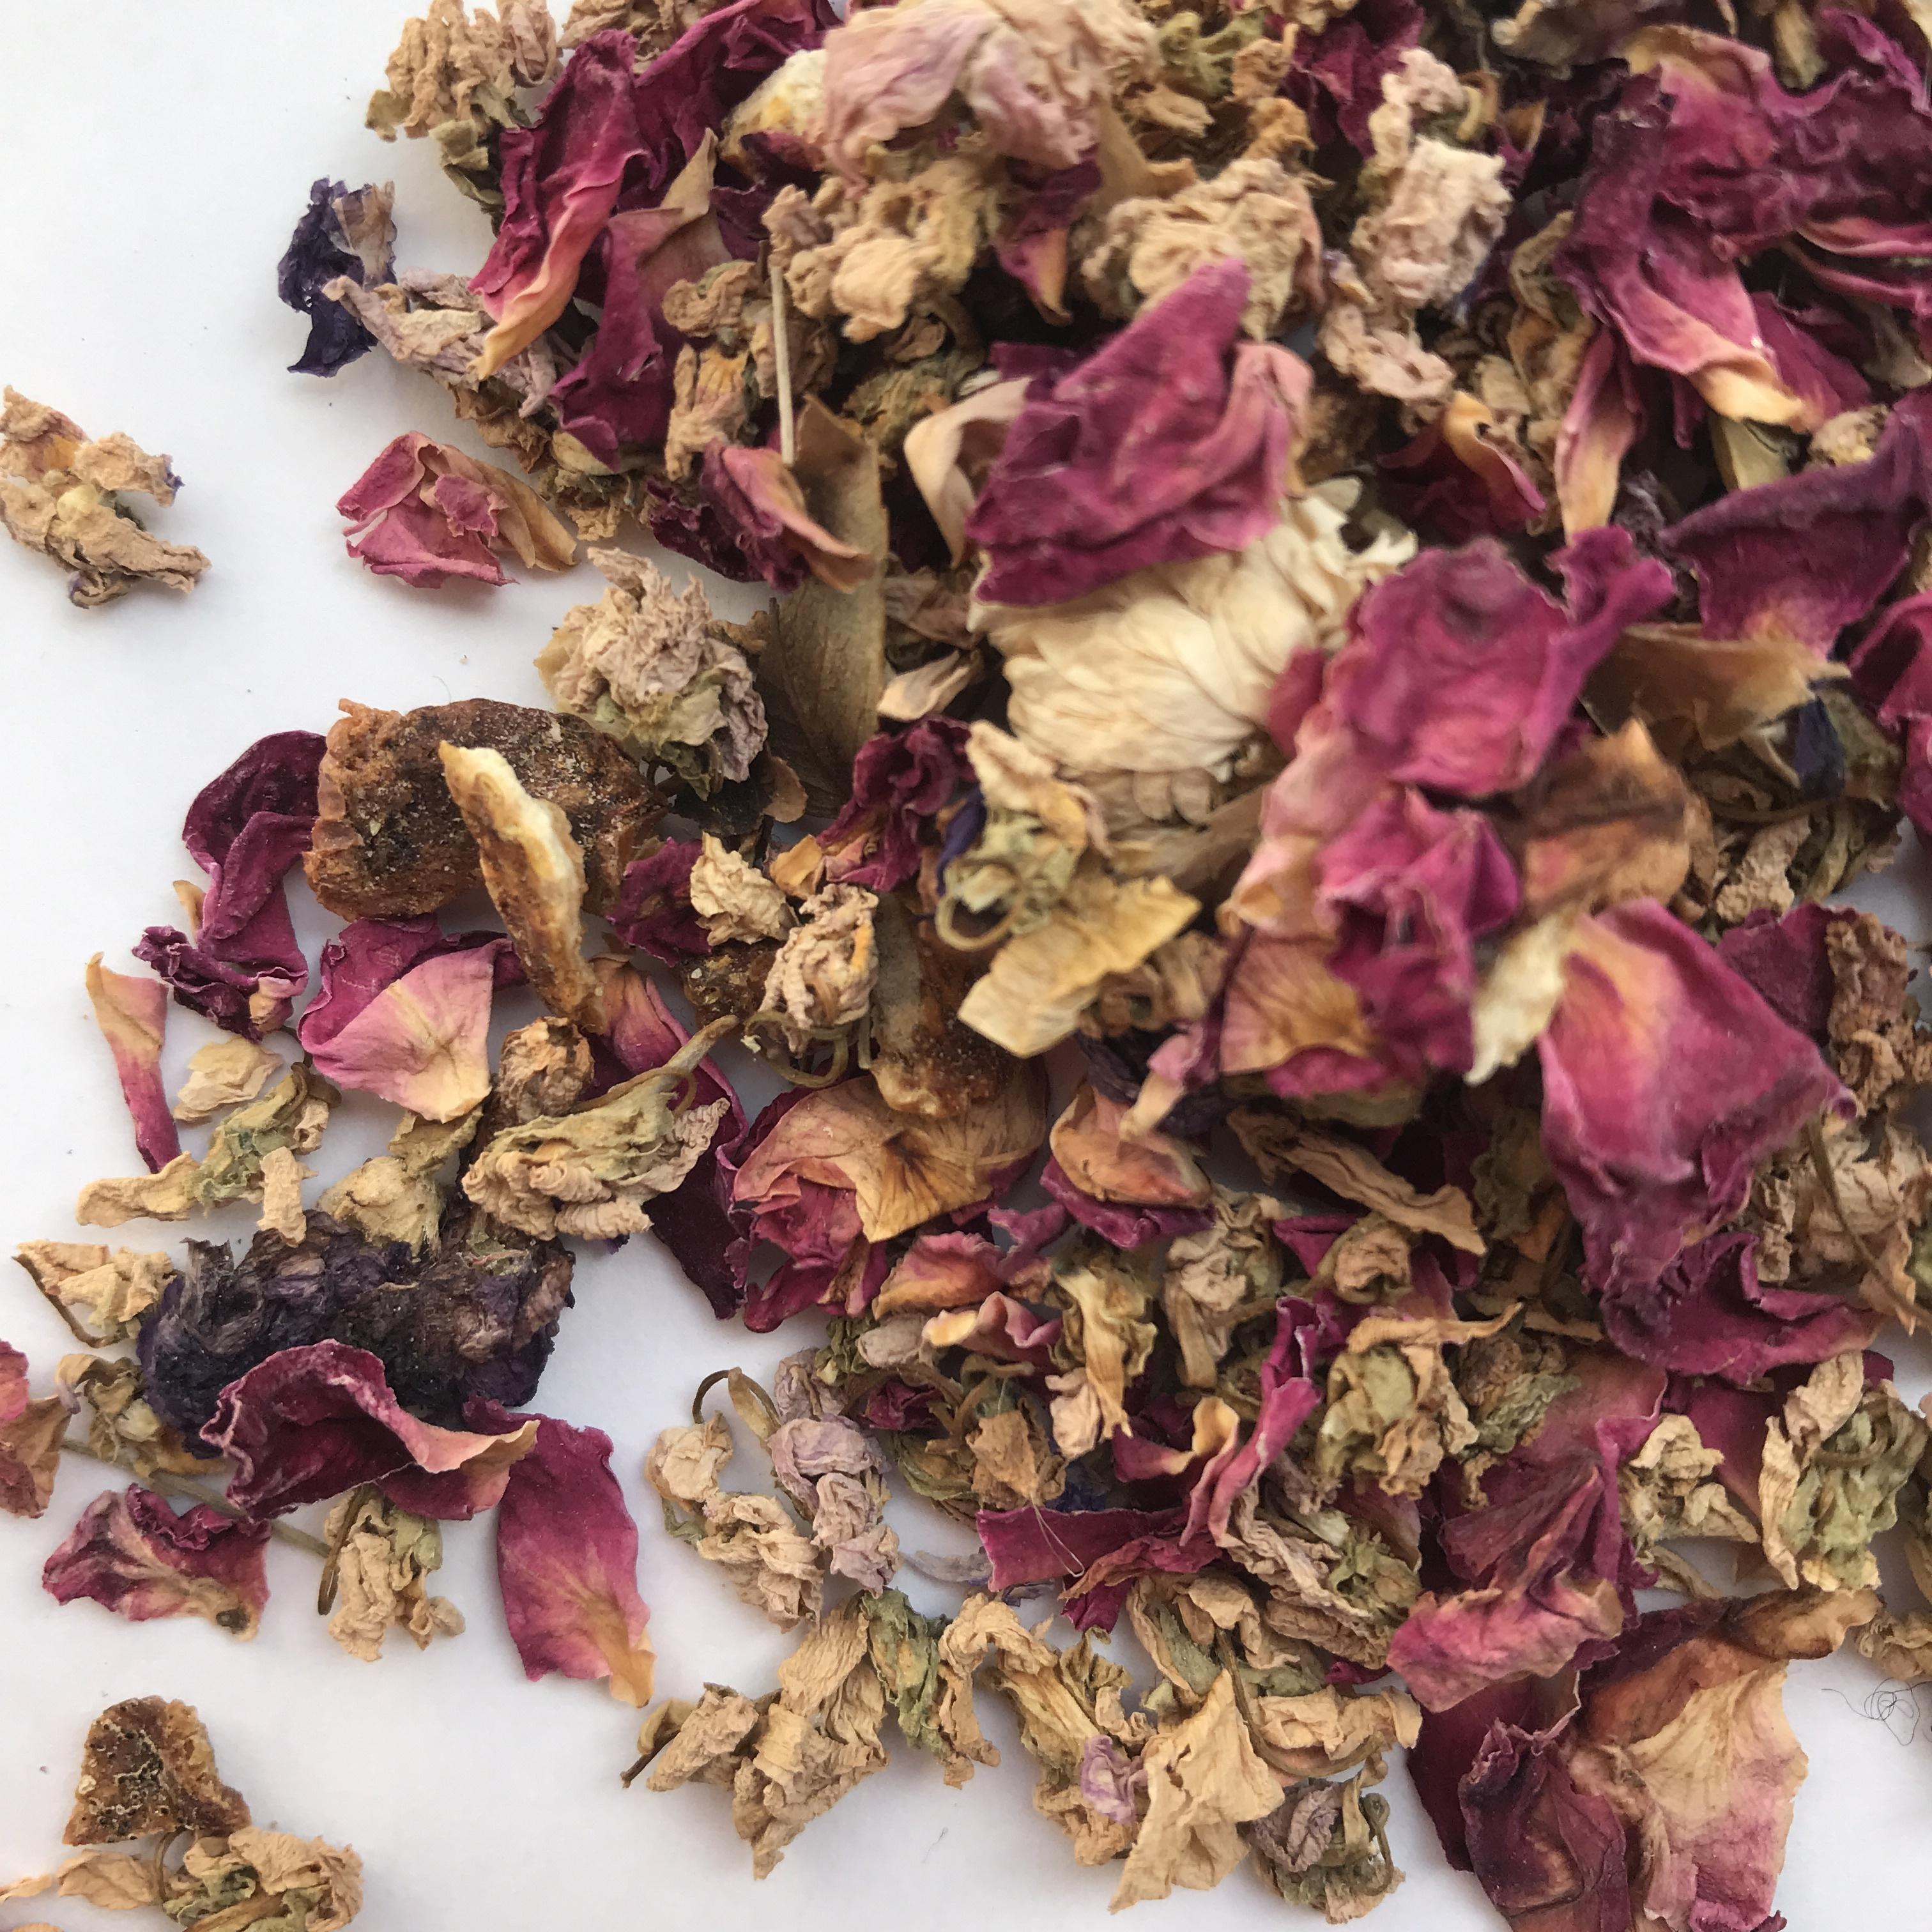 """ FROM NOW ON... herbal tea ハーブティー / Violet flower すみれのお花のハーブティー(小) 15g """